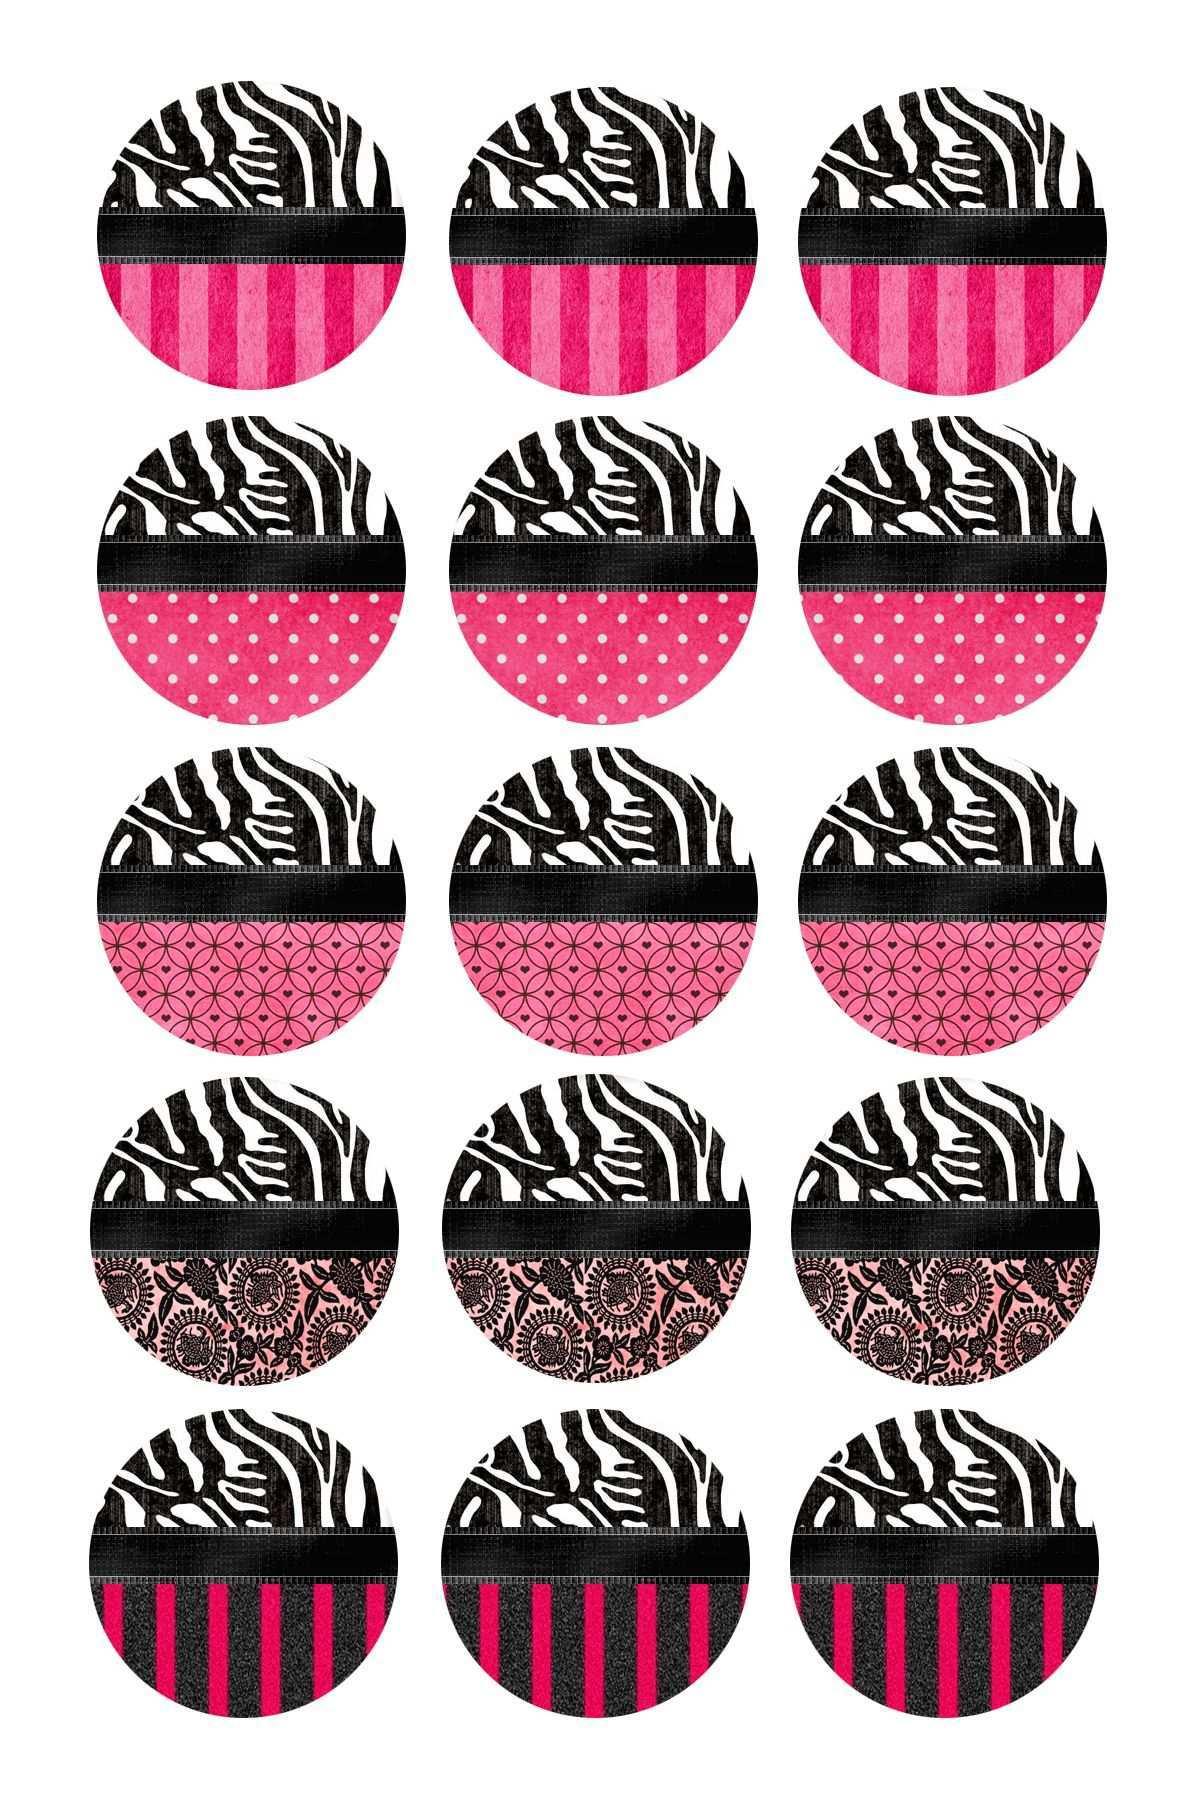 Editable Bottle Cap Images Cabochon Vorlagen Vorlagen Basteln